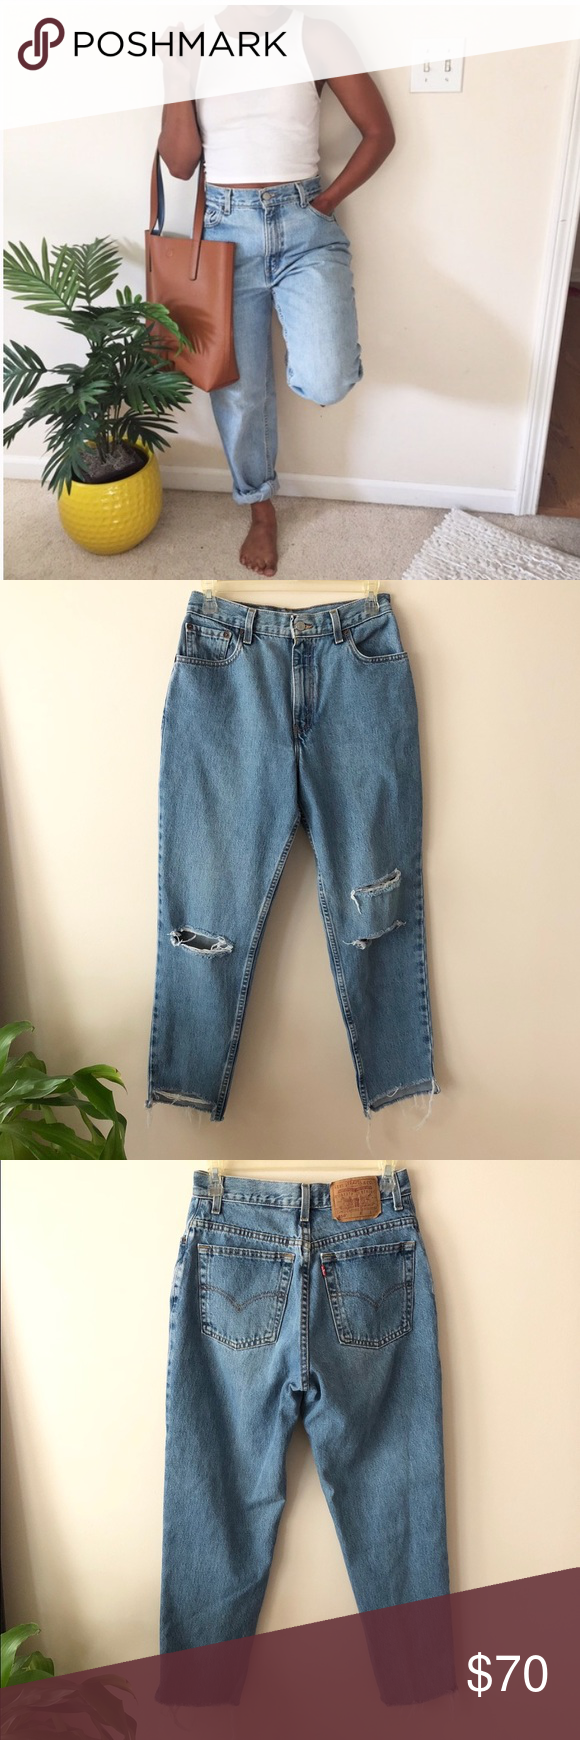 Vintage Levi's 550 High Rise Mom Jeans Vintage Levi's 550